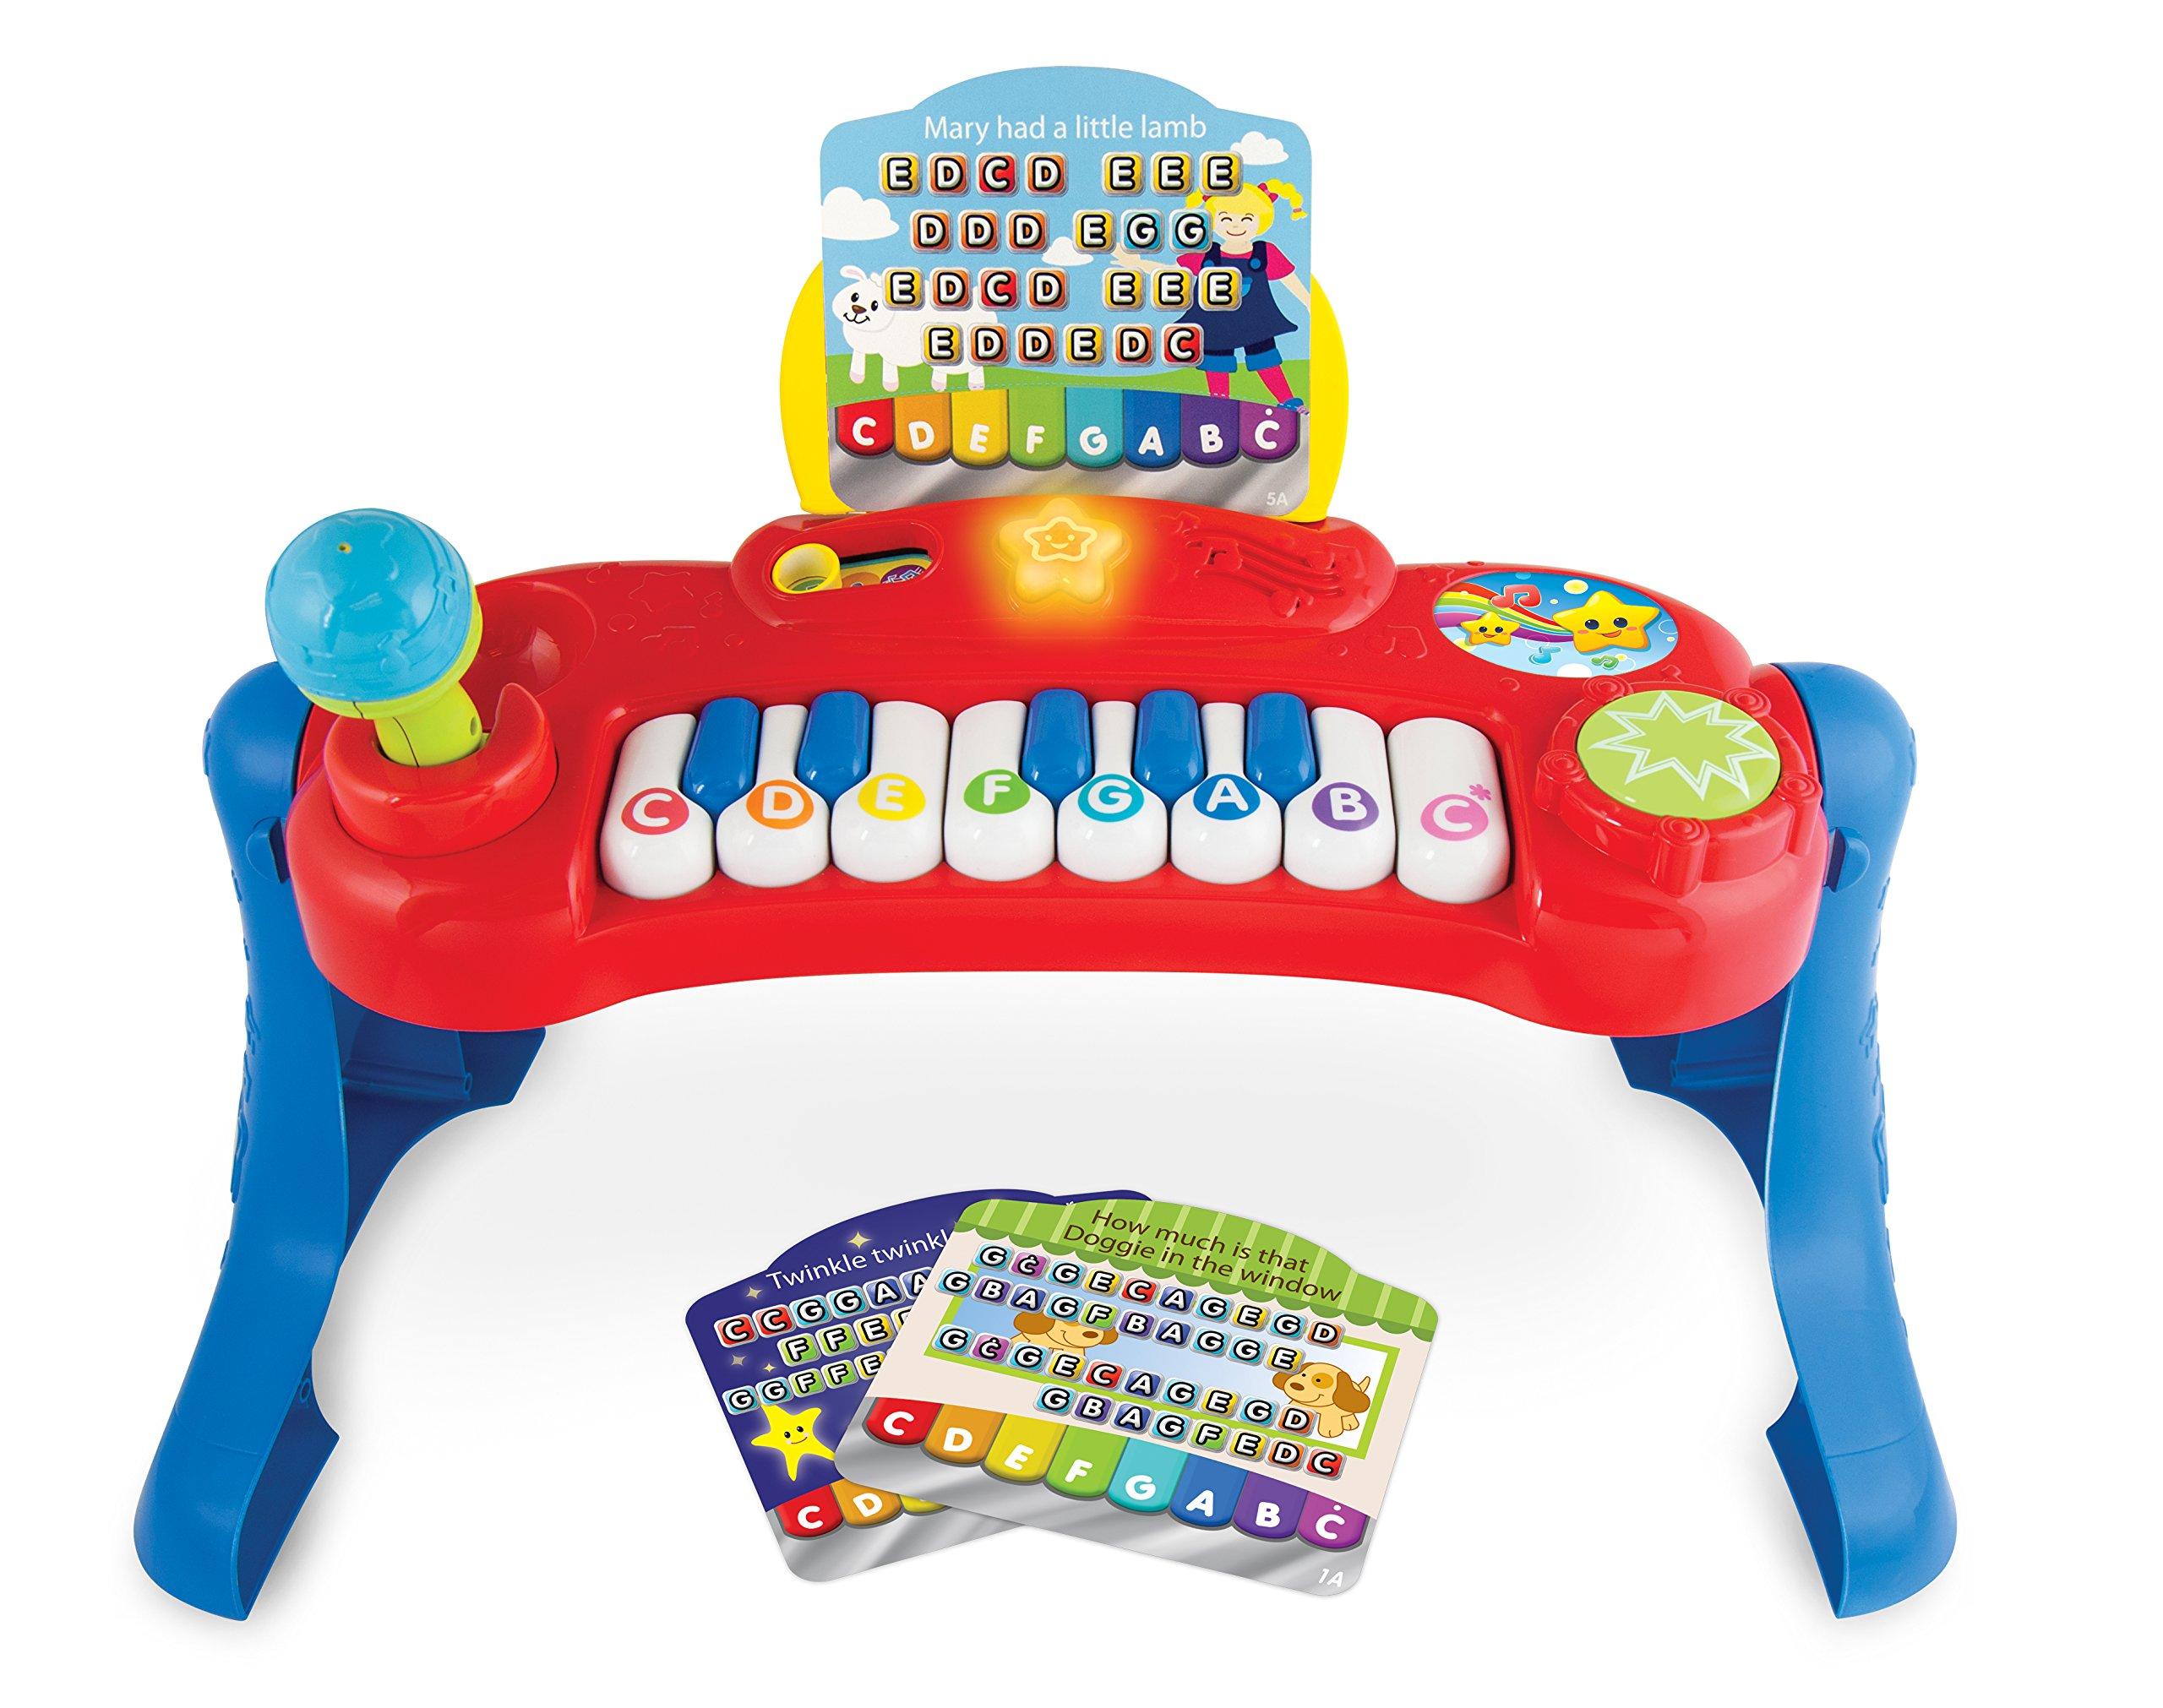 WinFun Baby Music Center Musical Keyboard, Red by WinFun